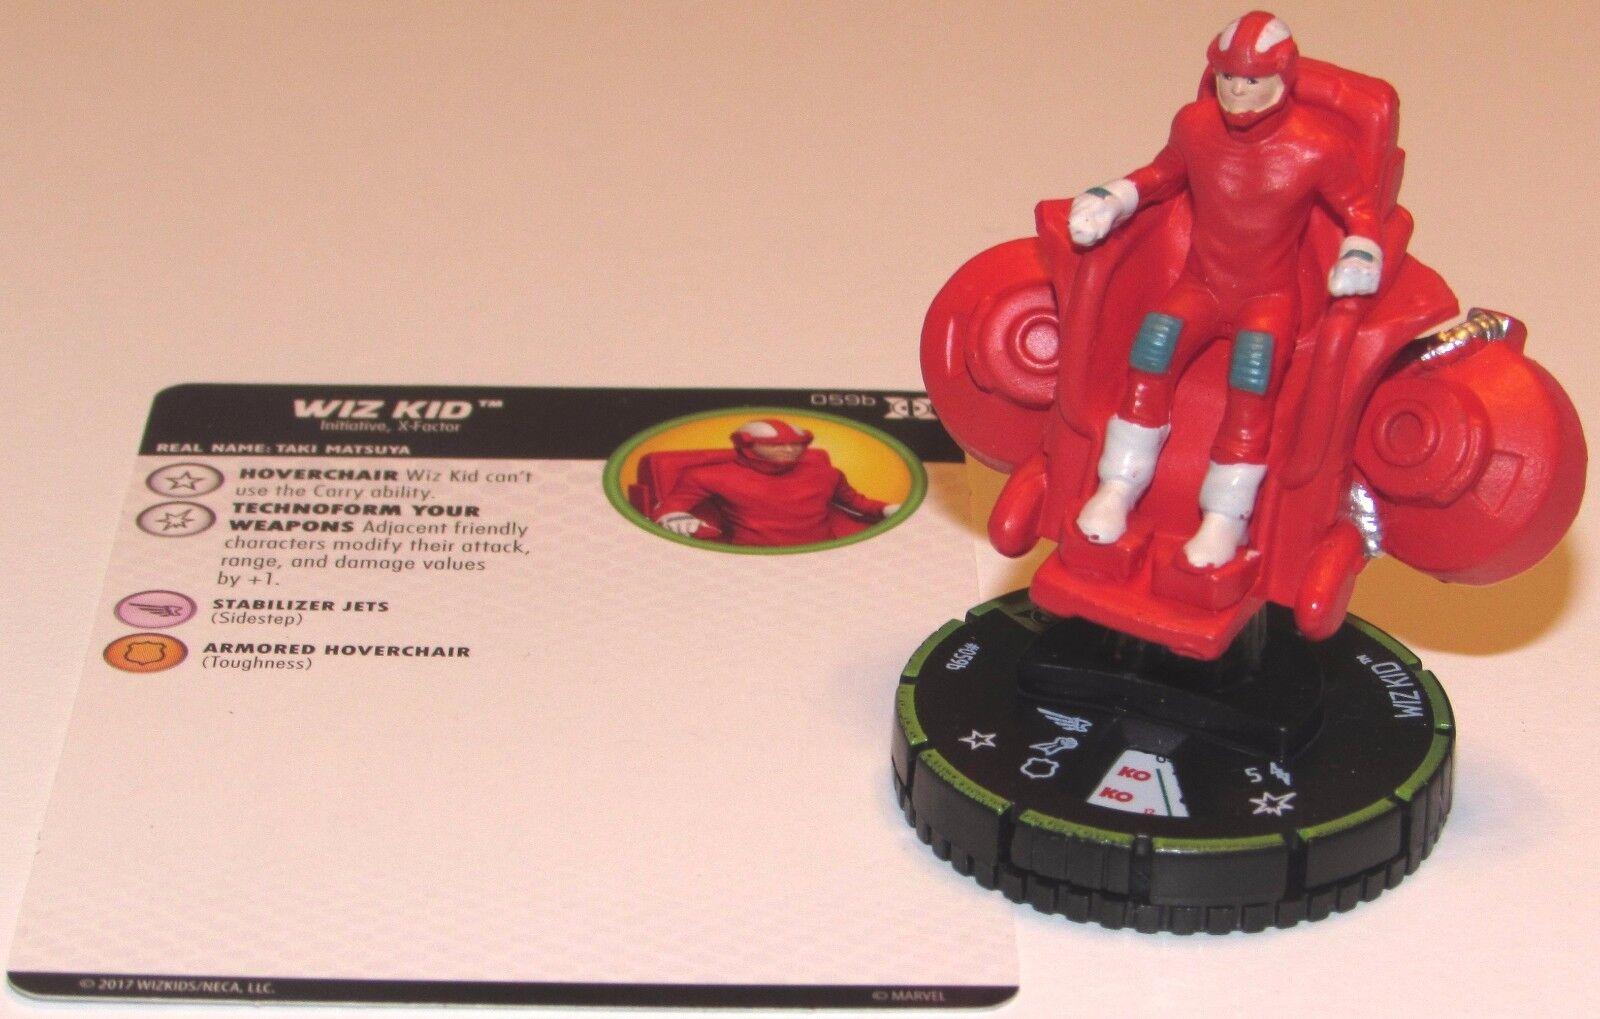 WIZ KID 059B PRIME Deadpool and X-Force Marvel HeroClix Super Rare